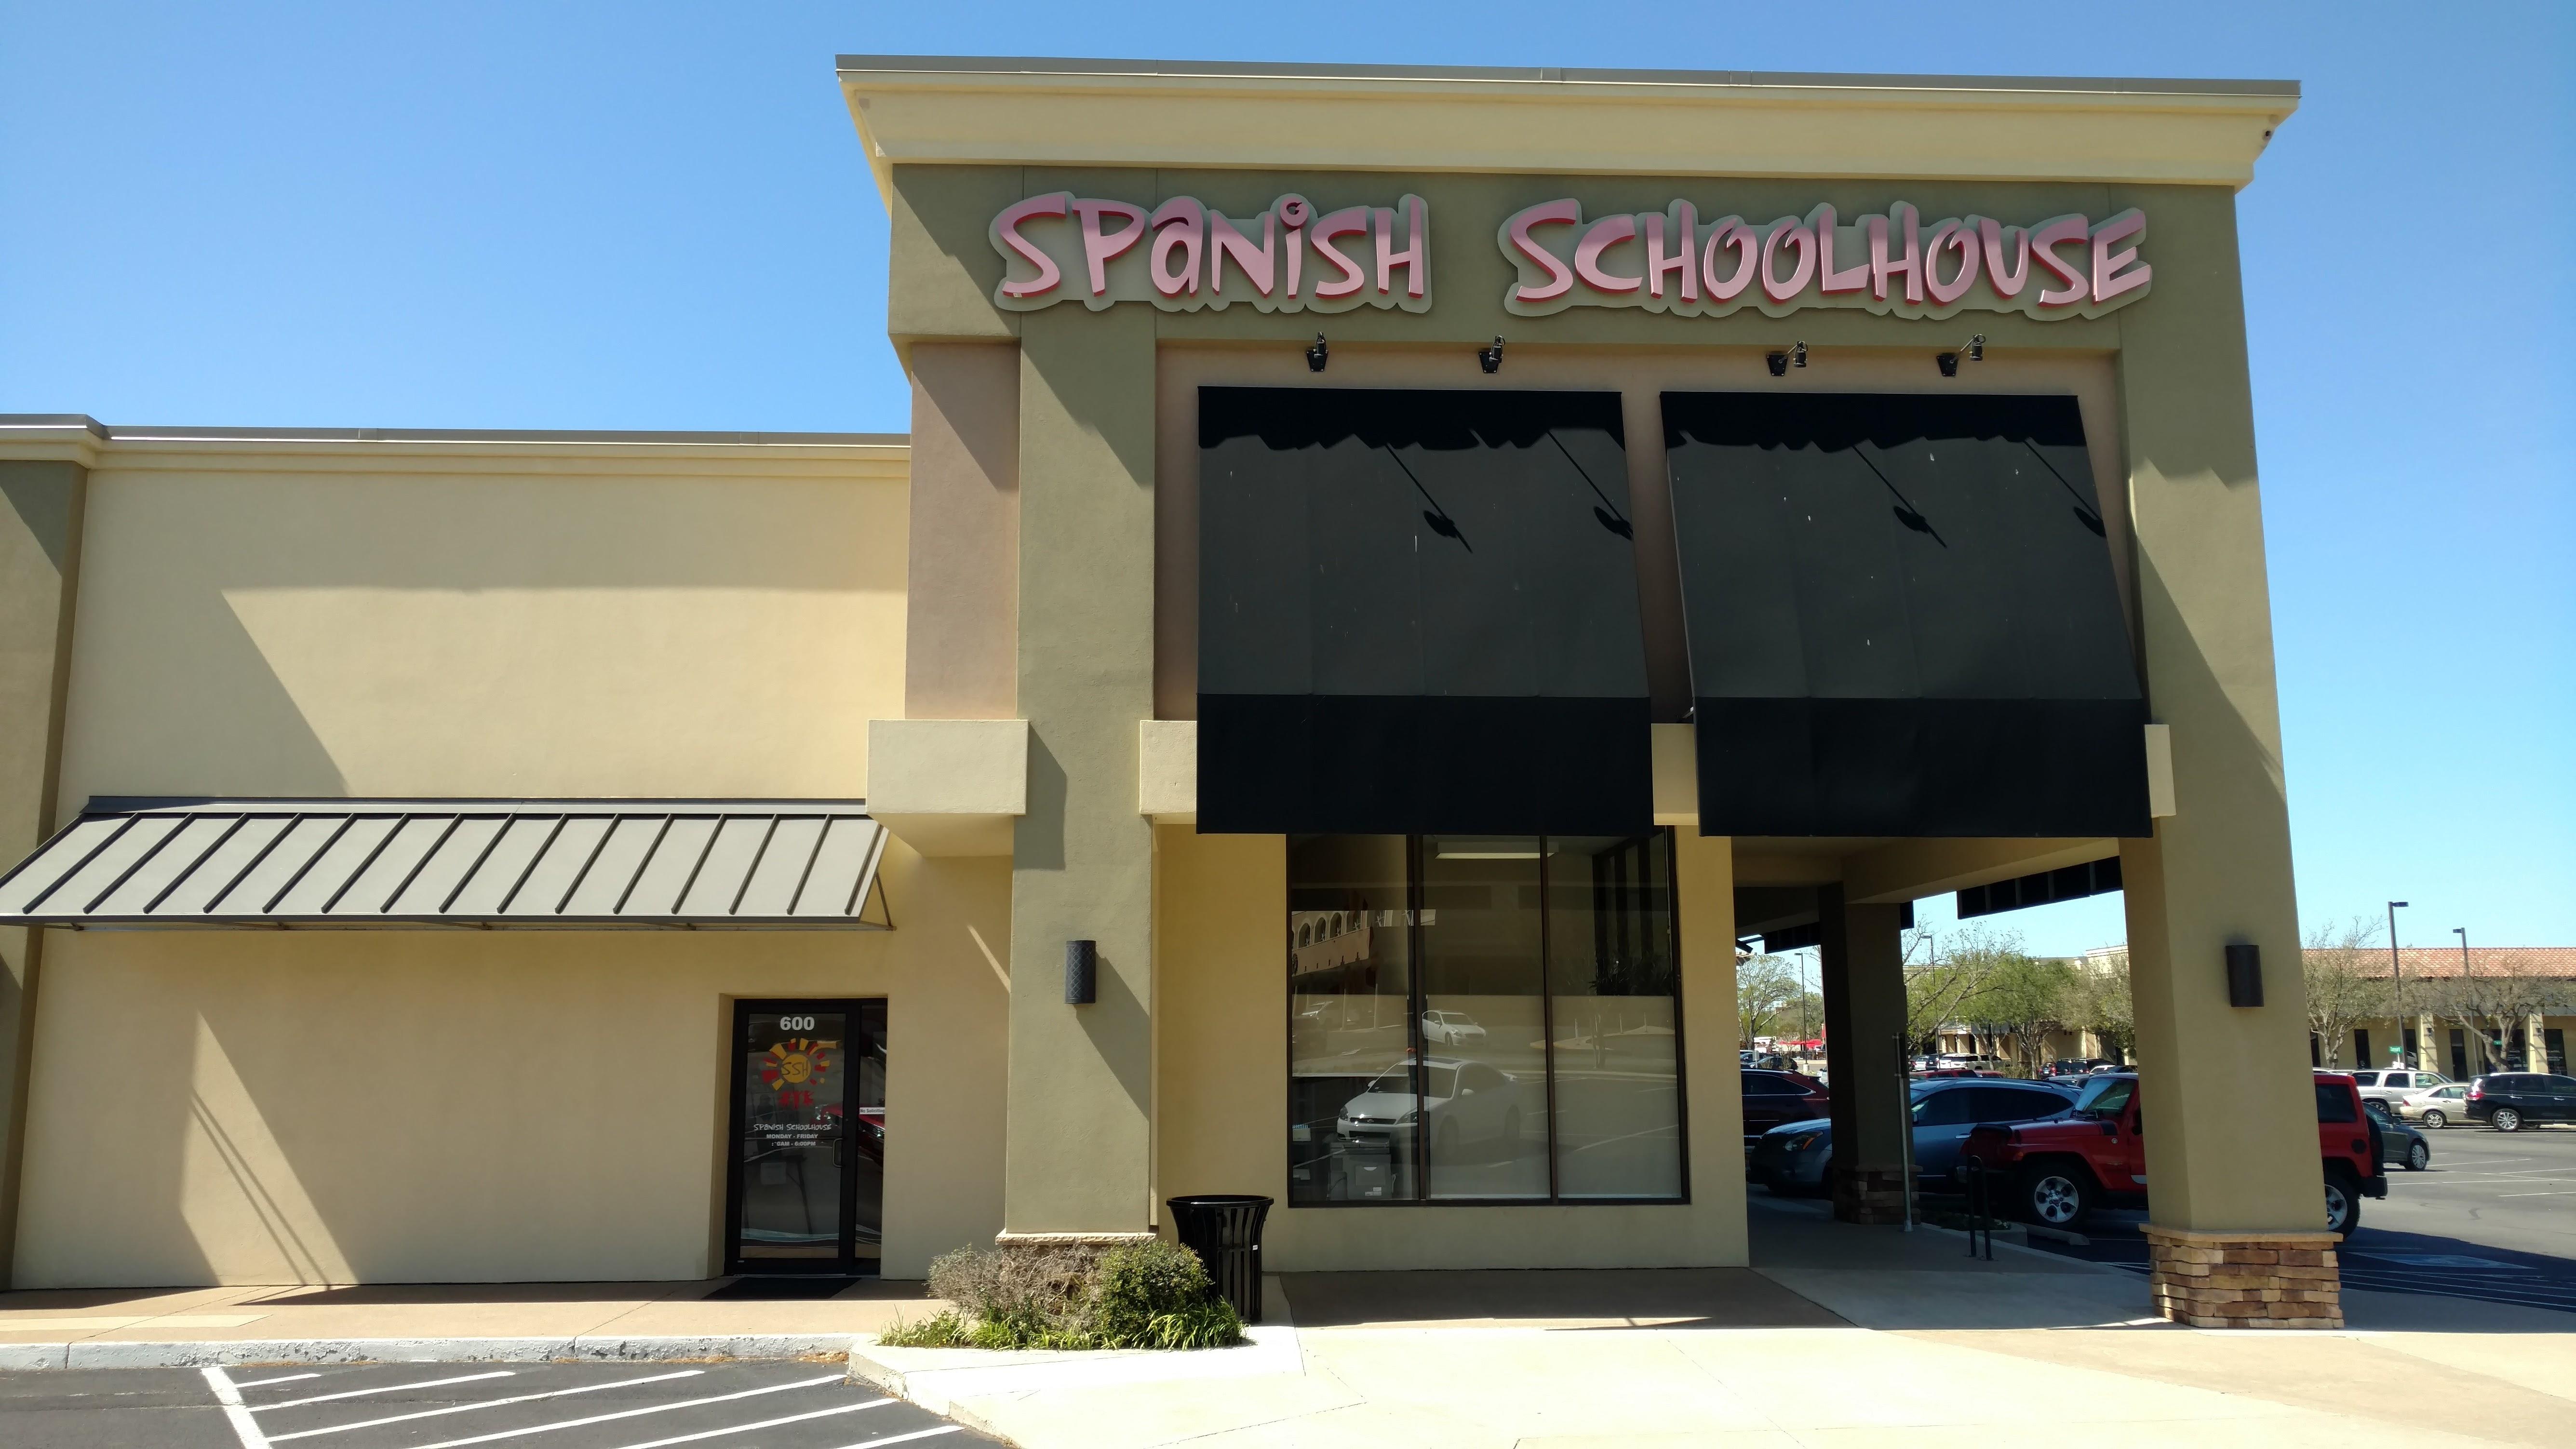 Spanish Schoolhouse image 1